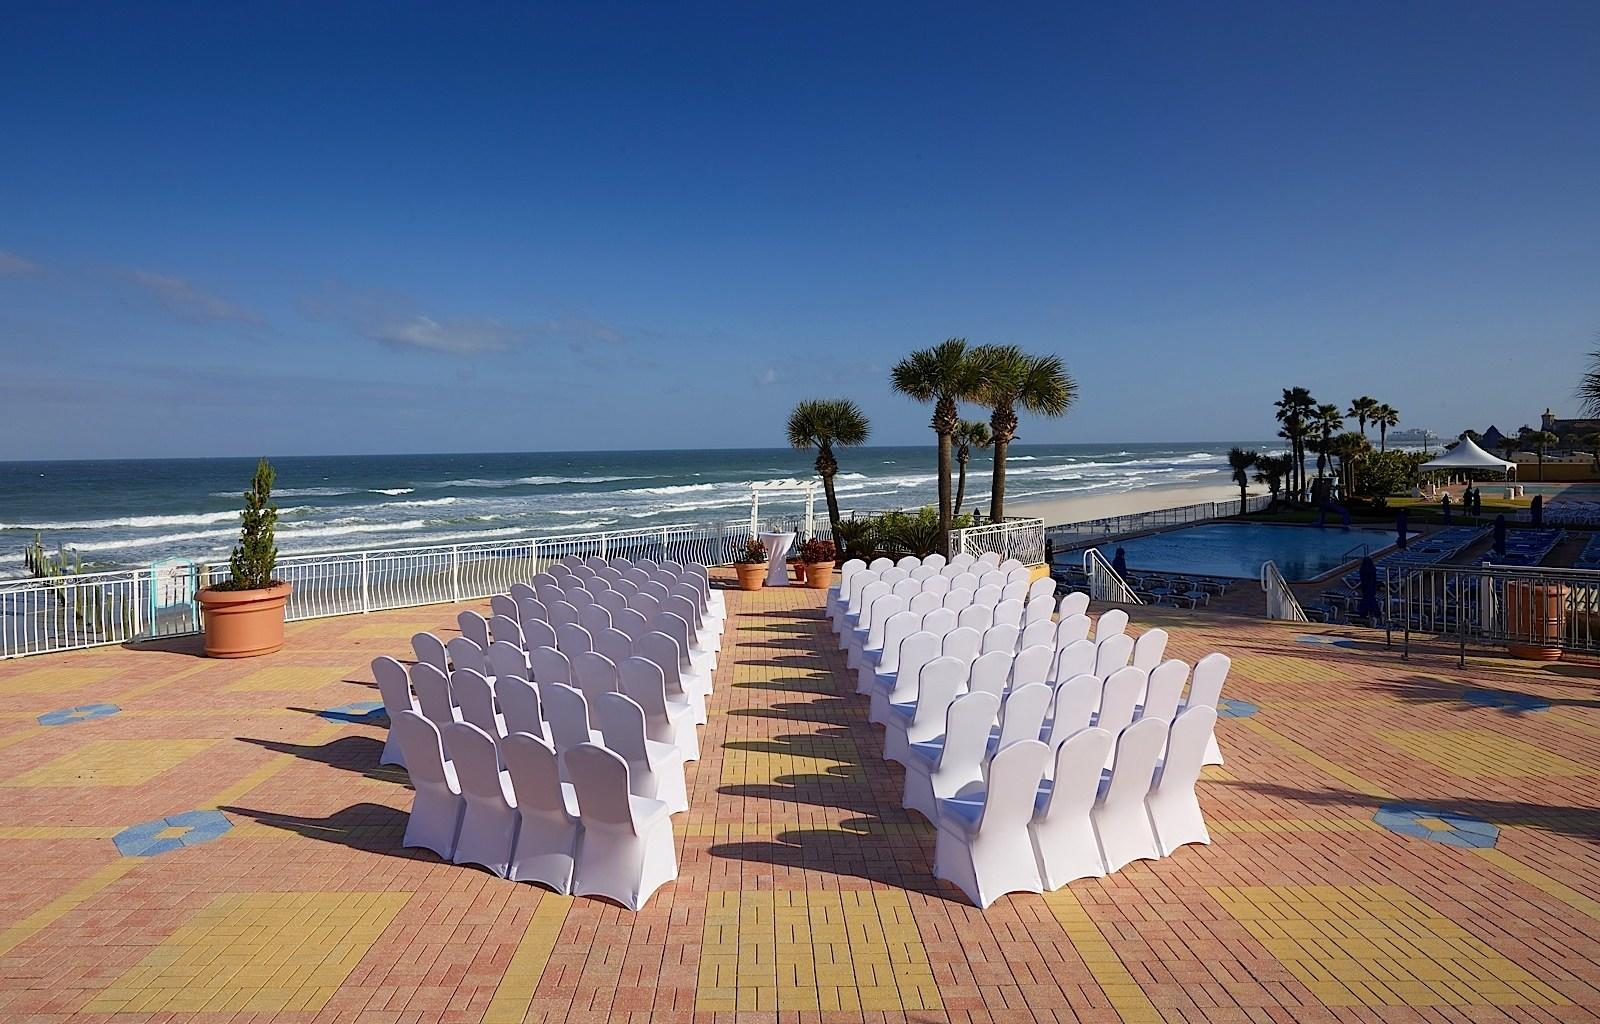 La Plaza Hotel Daytona Beach